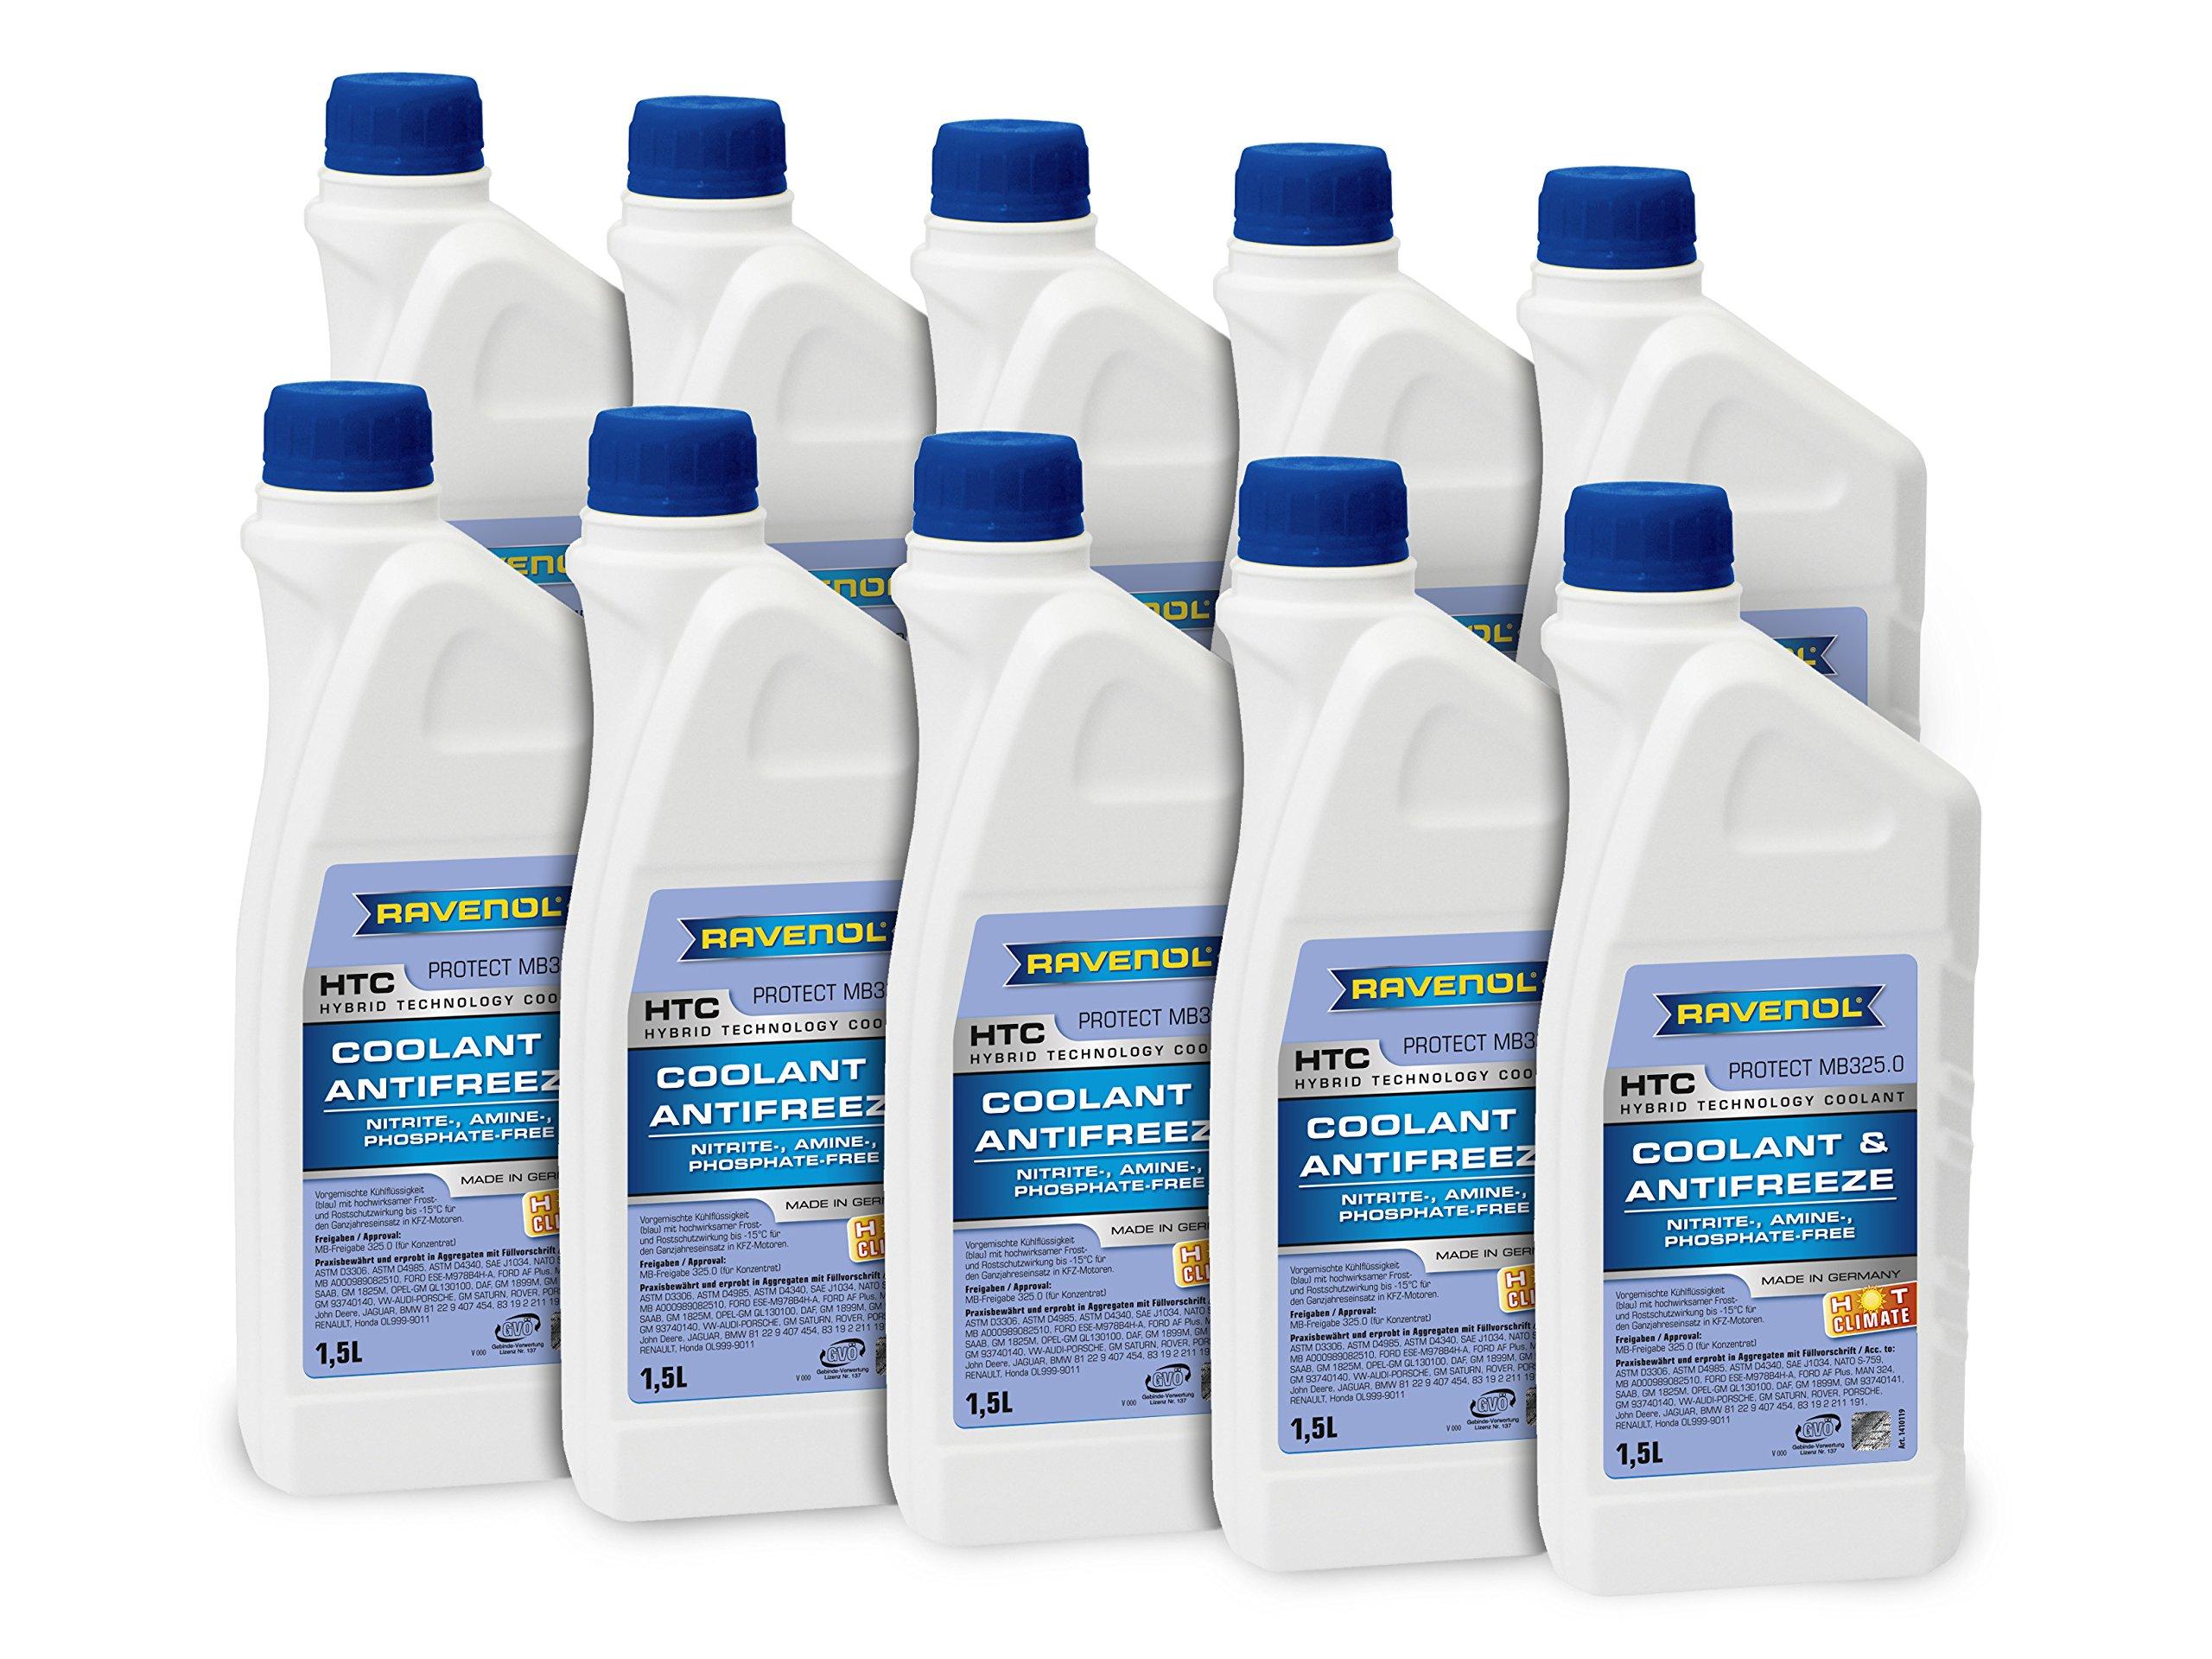 RAVENOL J4D2022-2-10 Coolant Antifreeze - HTC Hot Climate MB 325.0, VW TL 774-C (G11) (1.5L, Case of 10) by Ravenol